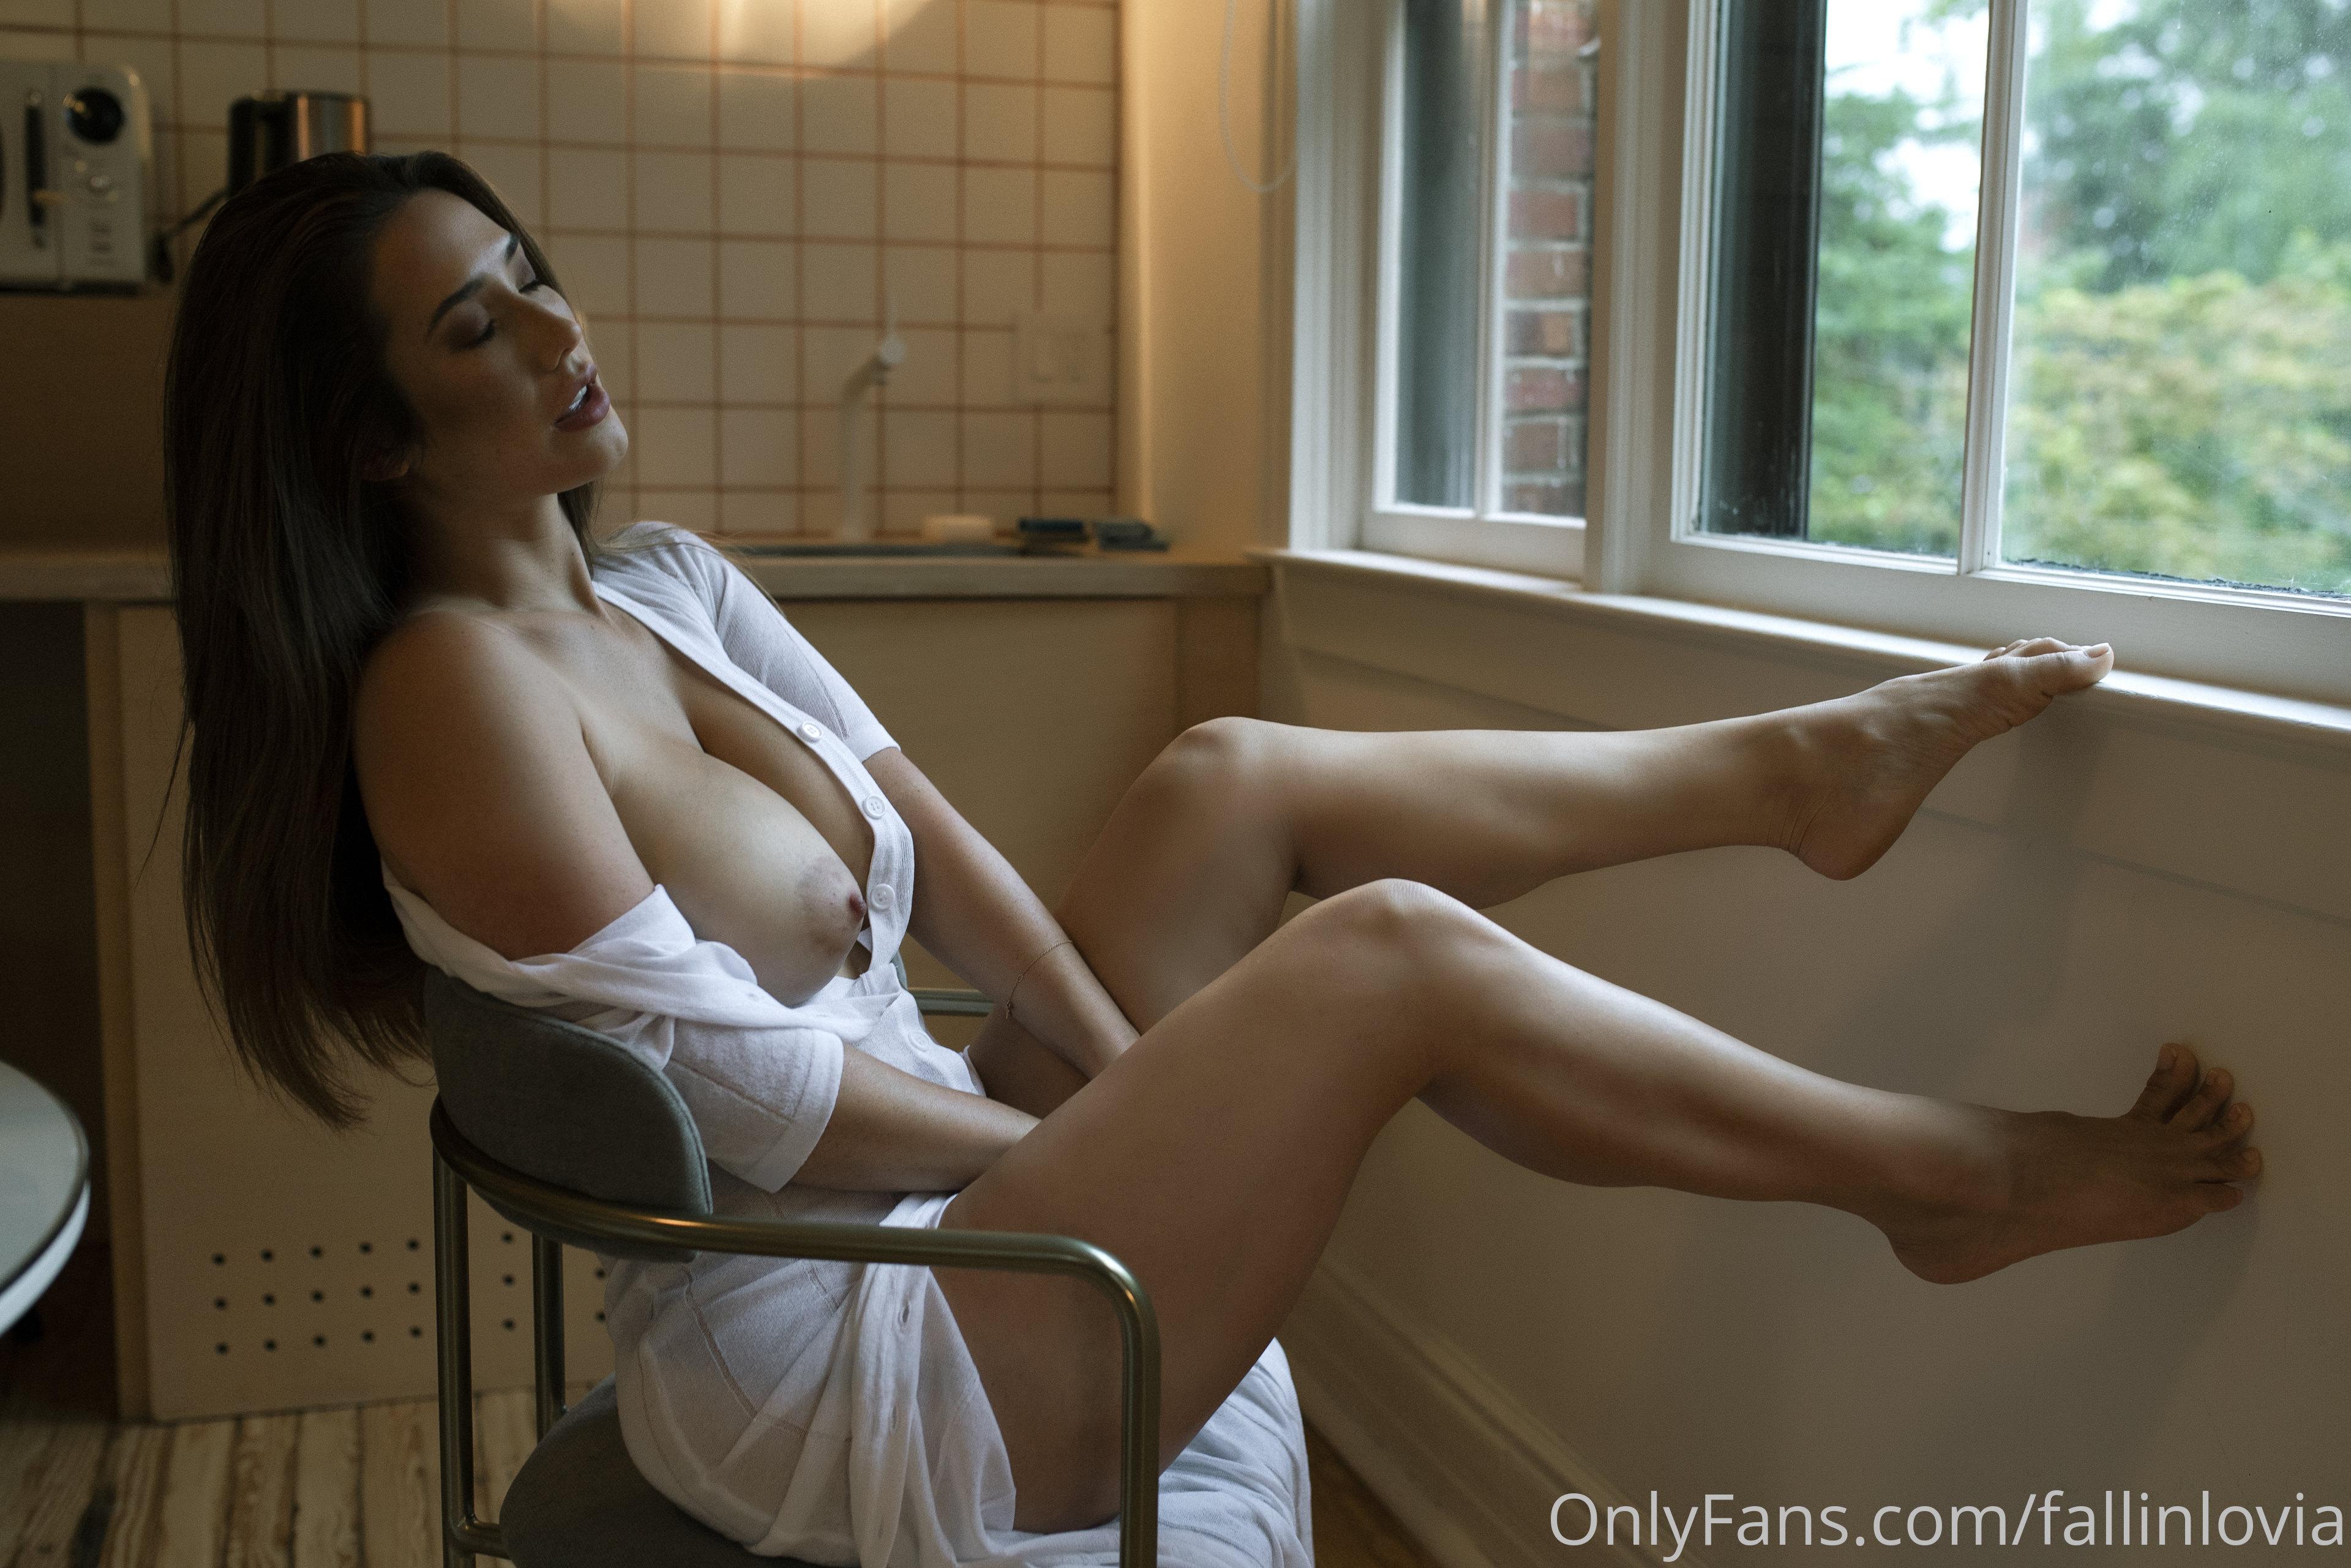 Eva Lovia, Fallinlovia, Onlyfans 0205